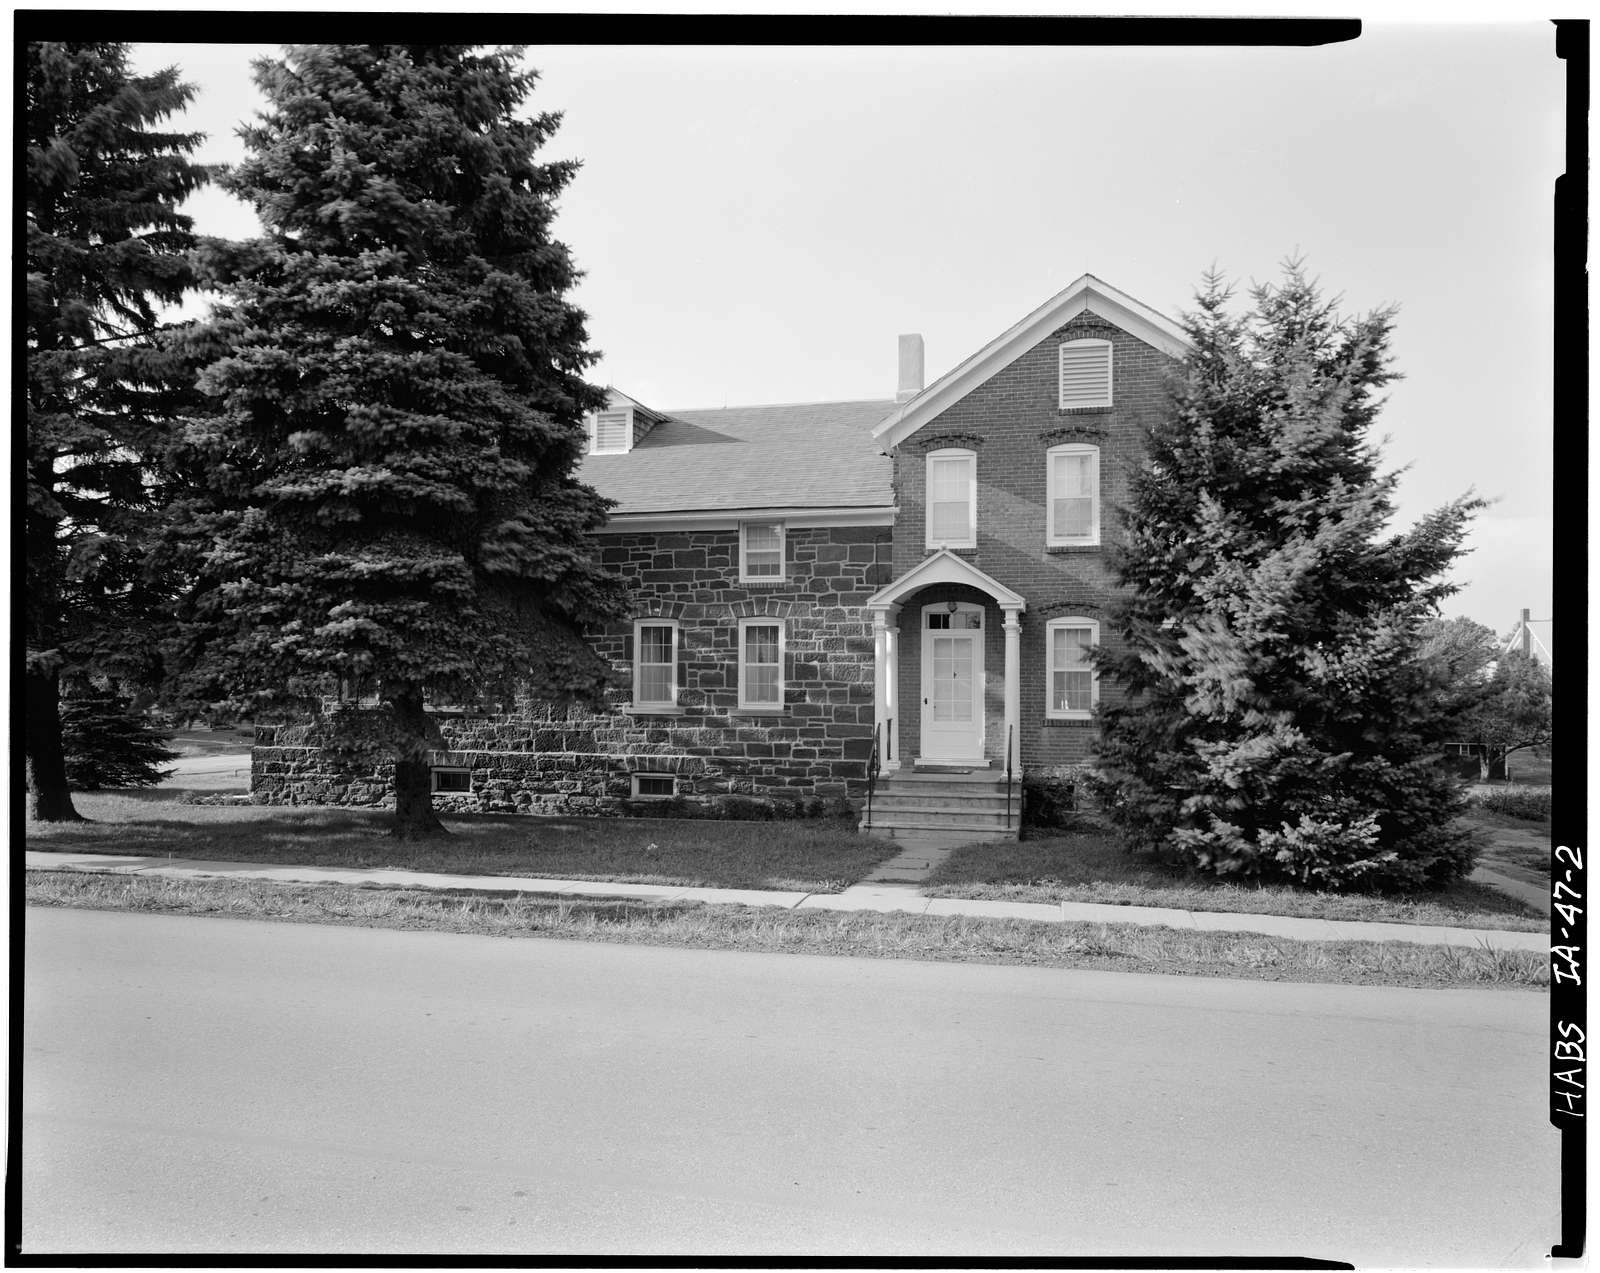 W. F. Moershal House, State Route 220, Amana, Iowa County, IA